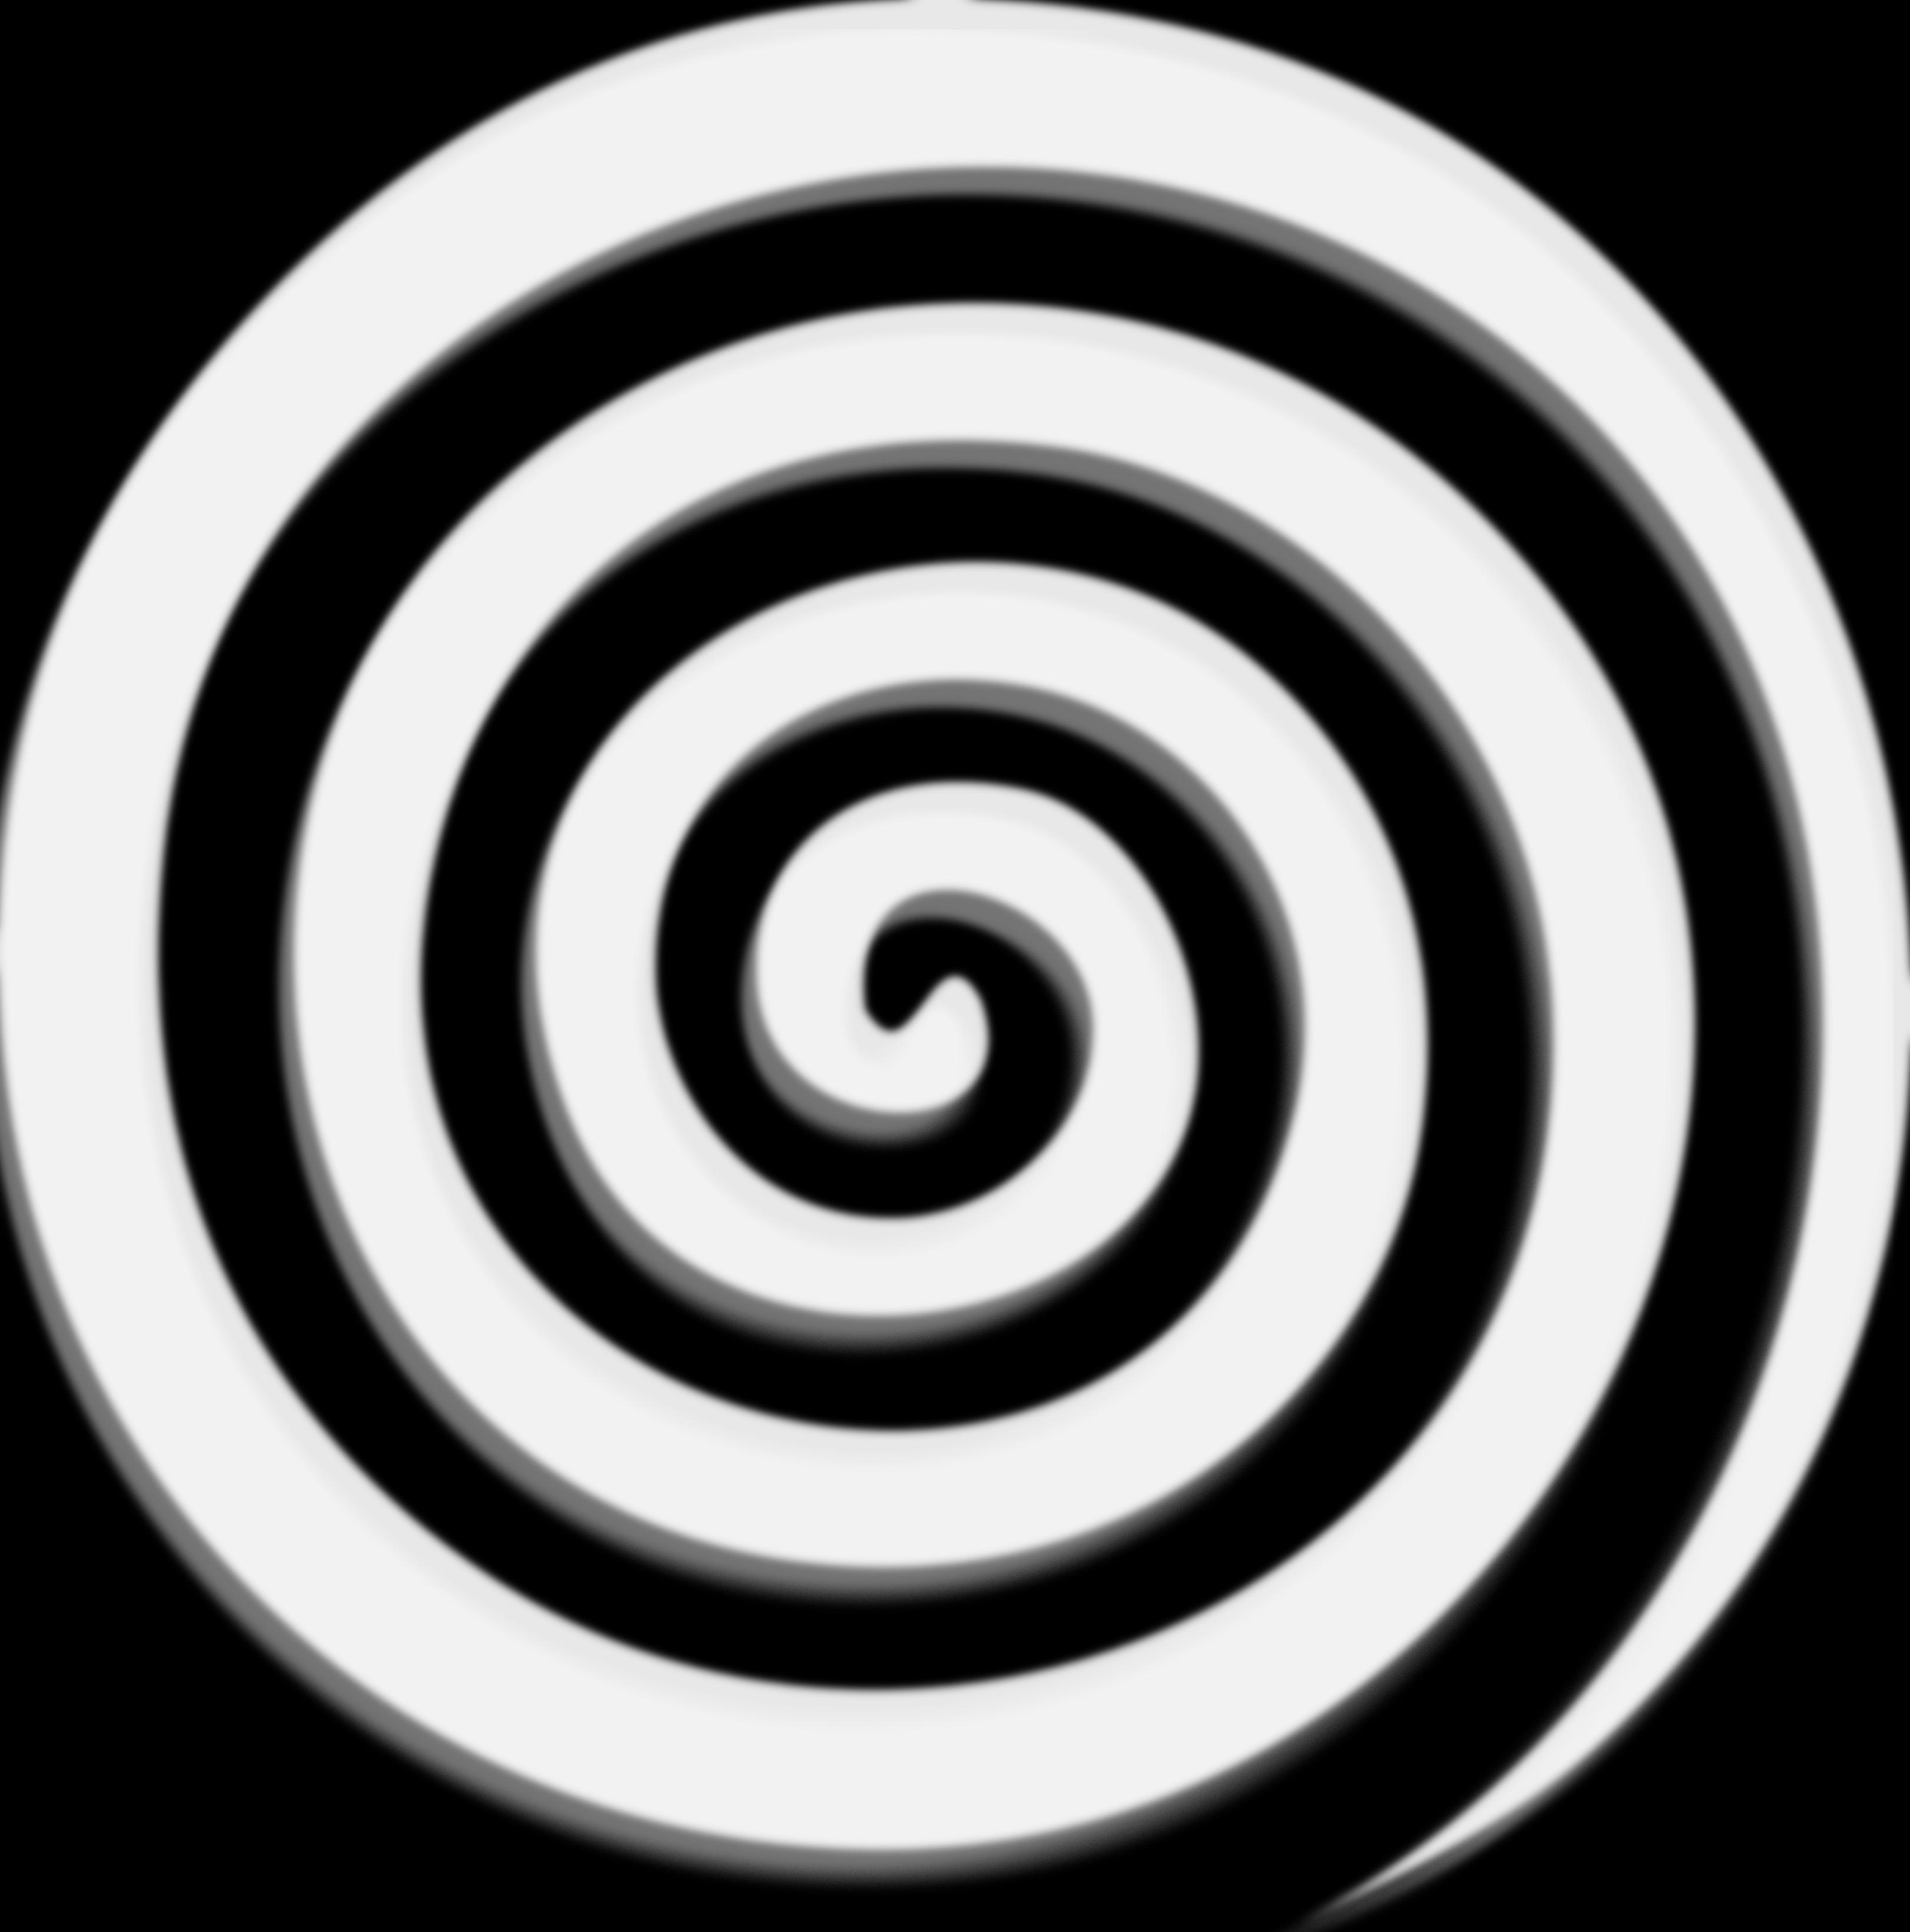 Hypnosis #21